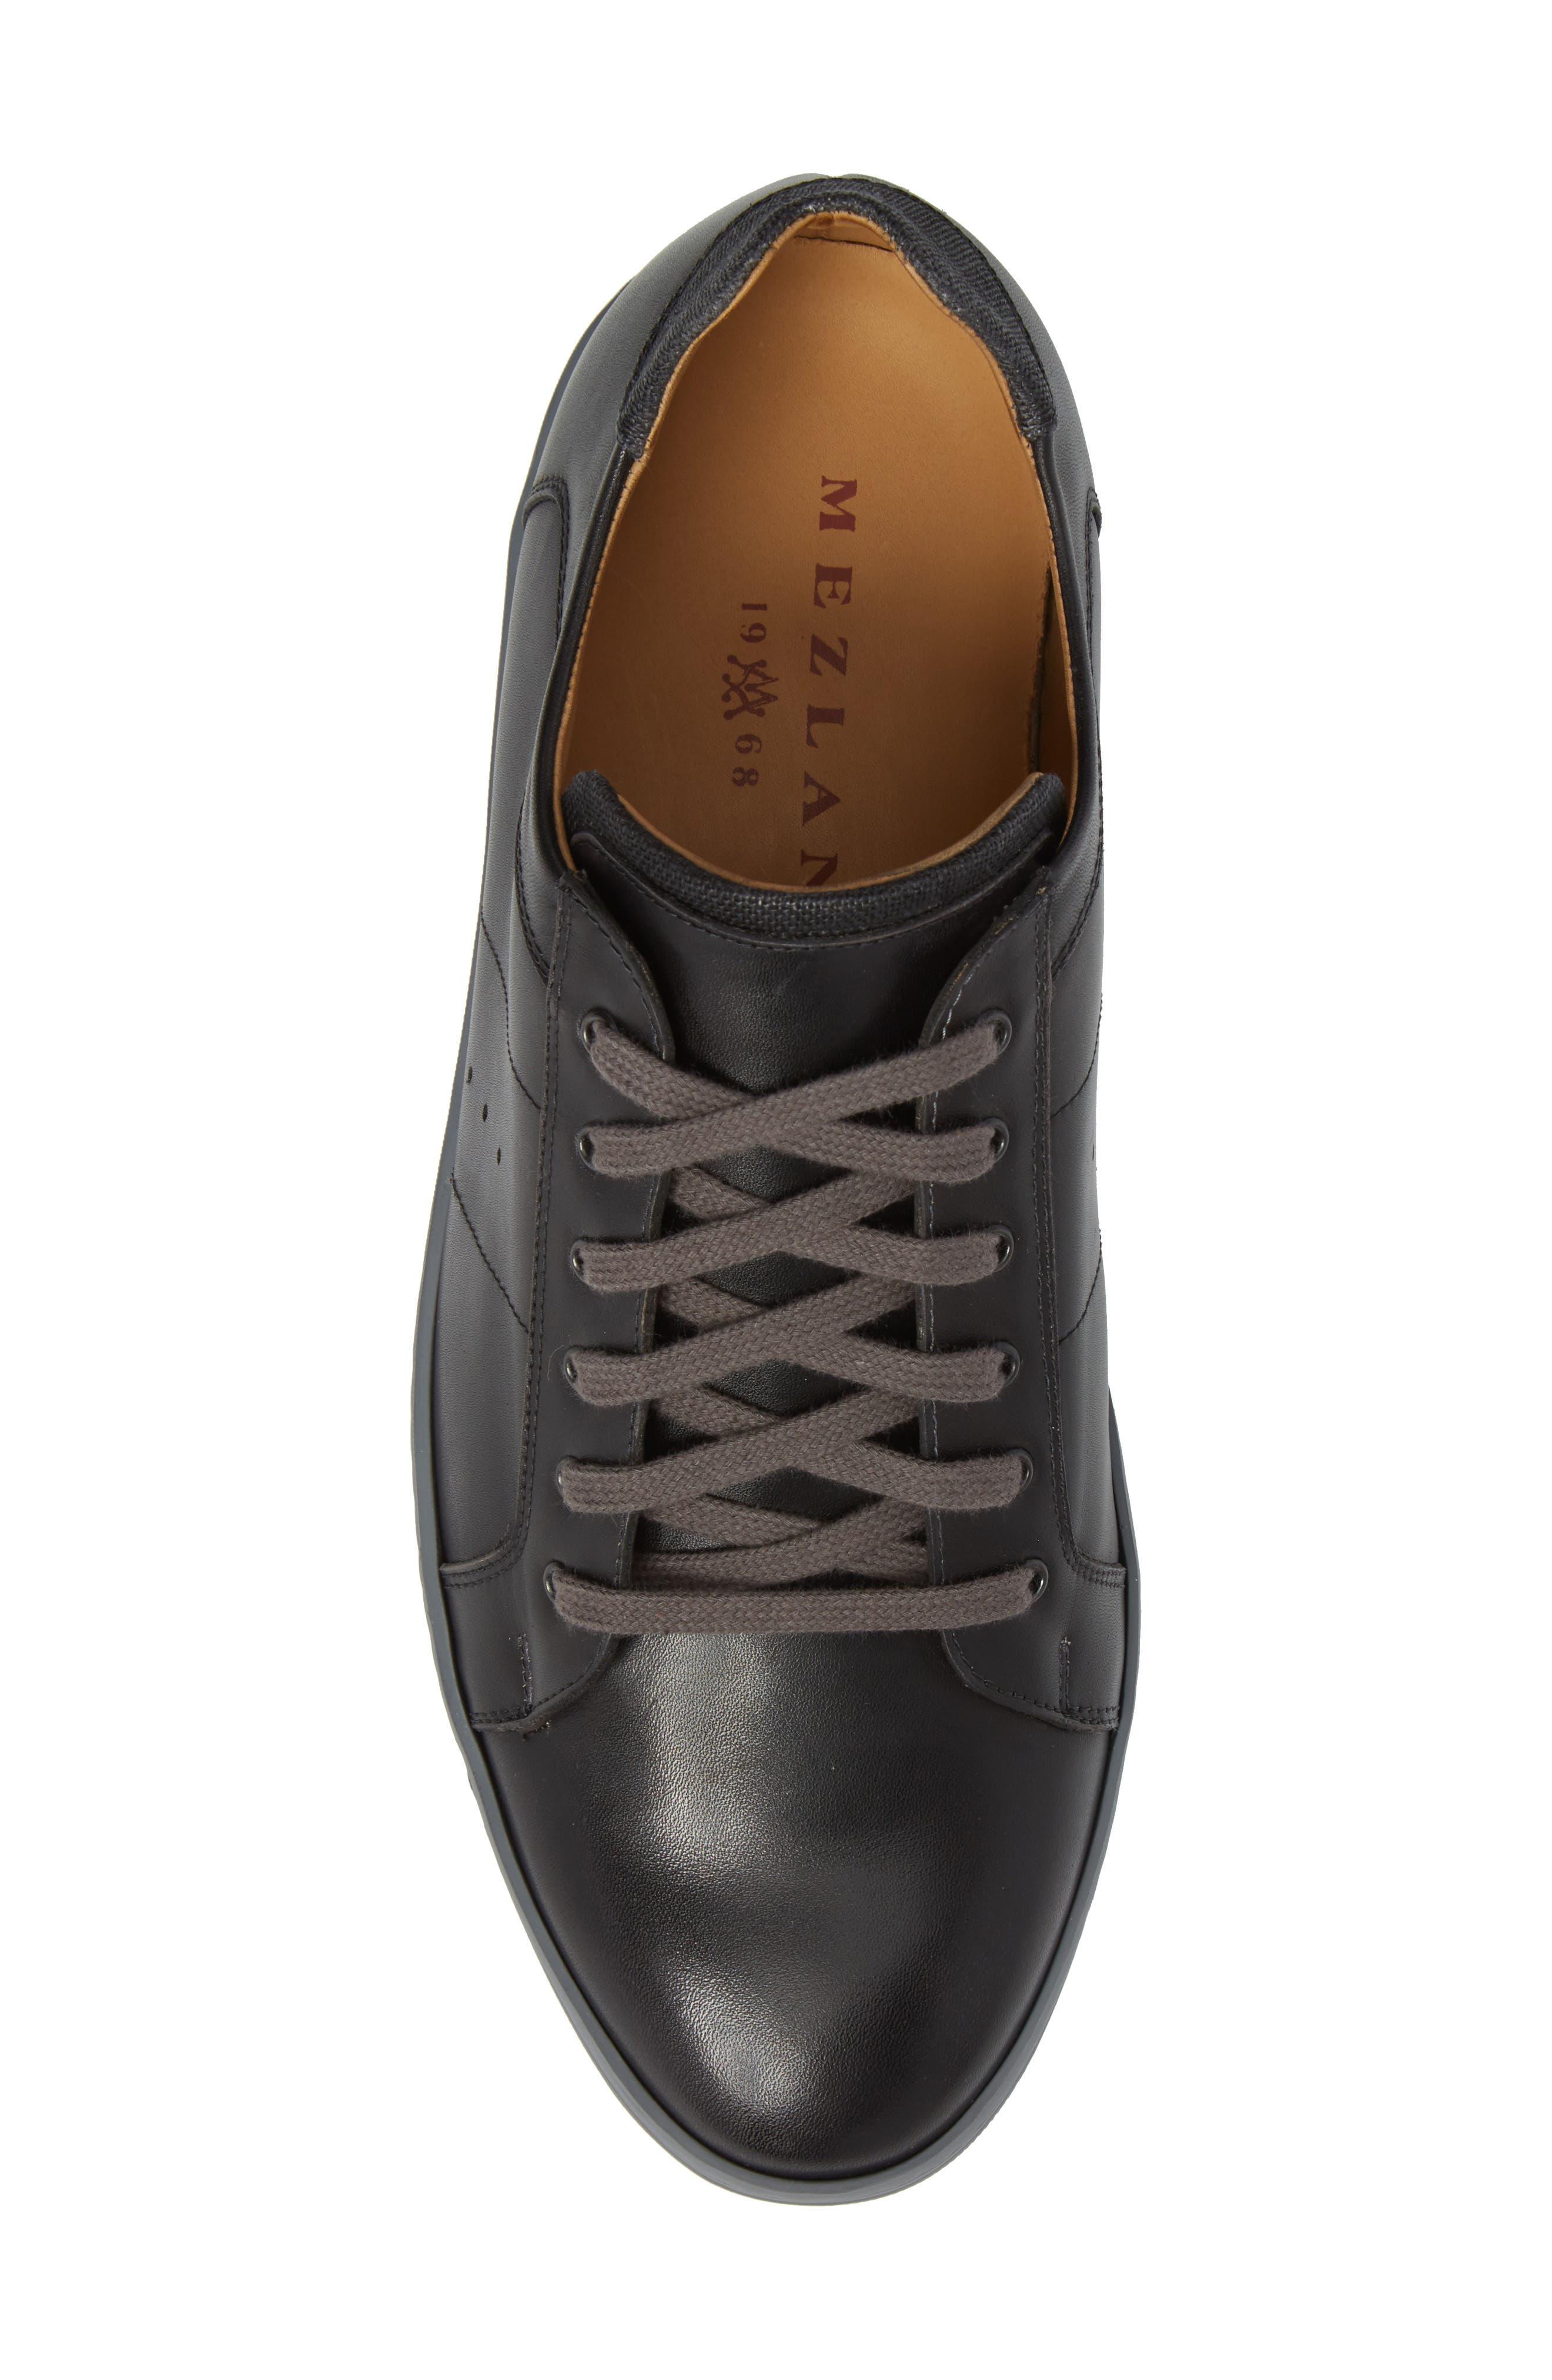 Cuzco Sneaker,                             Alternate thumbnail 5, color,                             GRAPHITE/ BLACK LEATHER